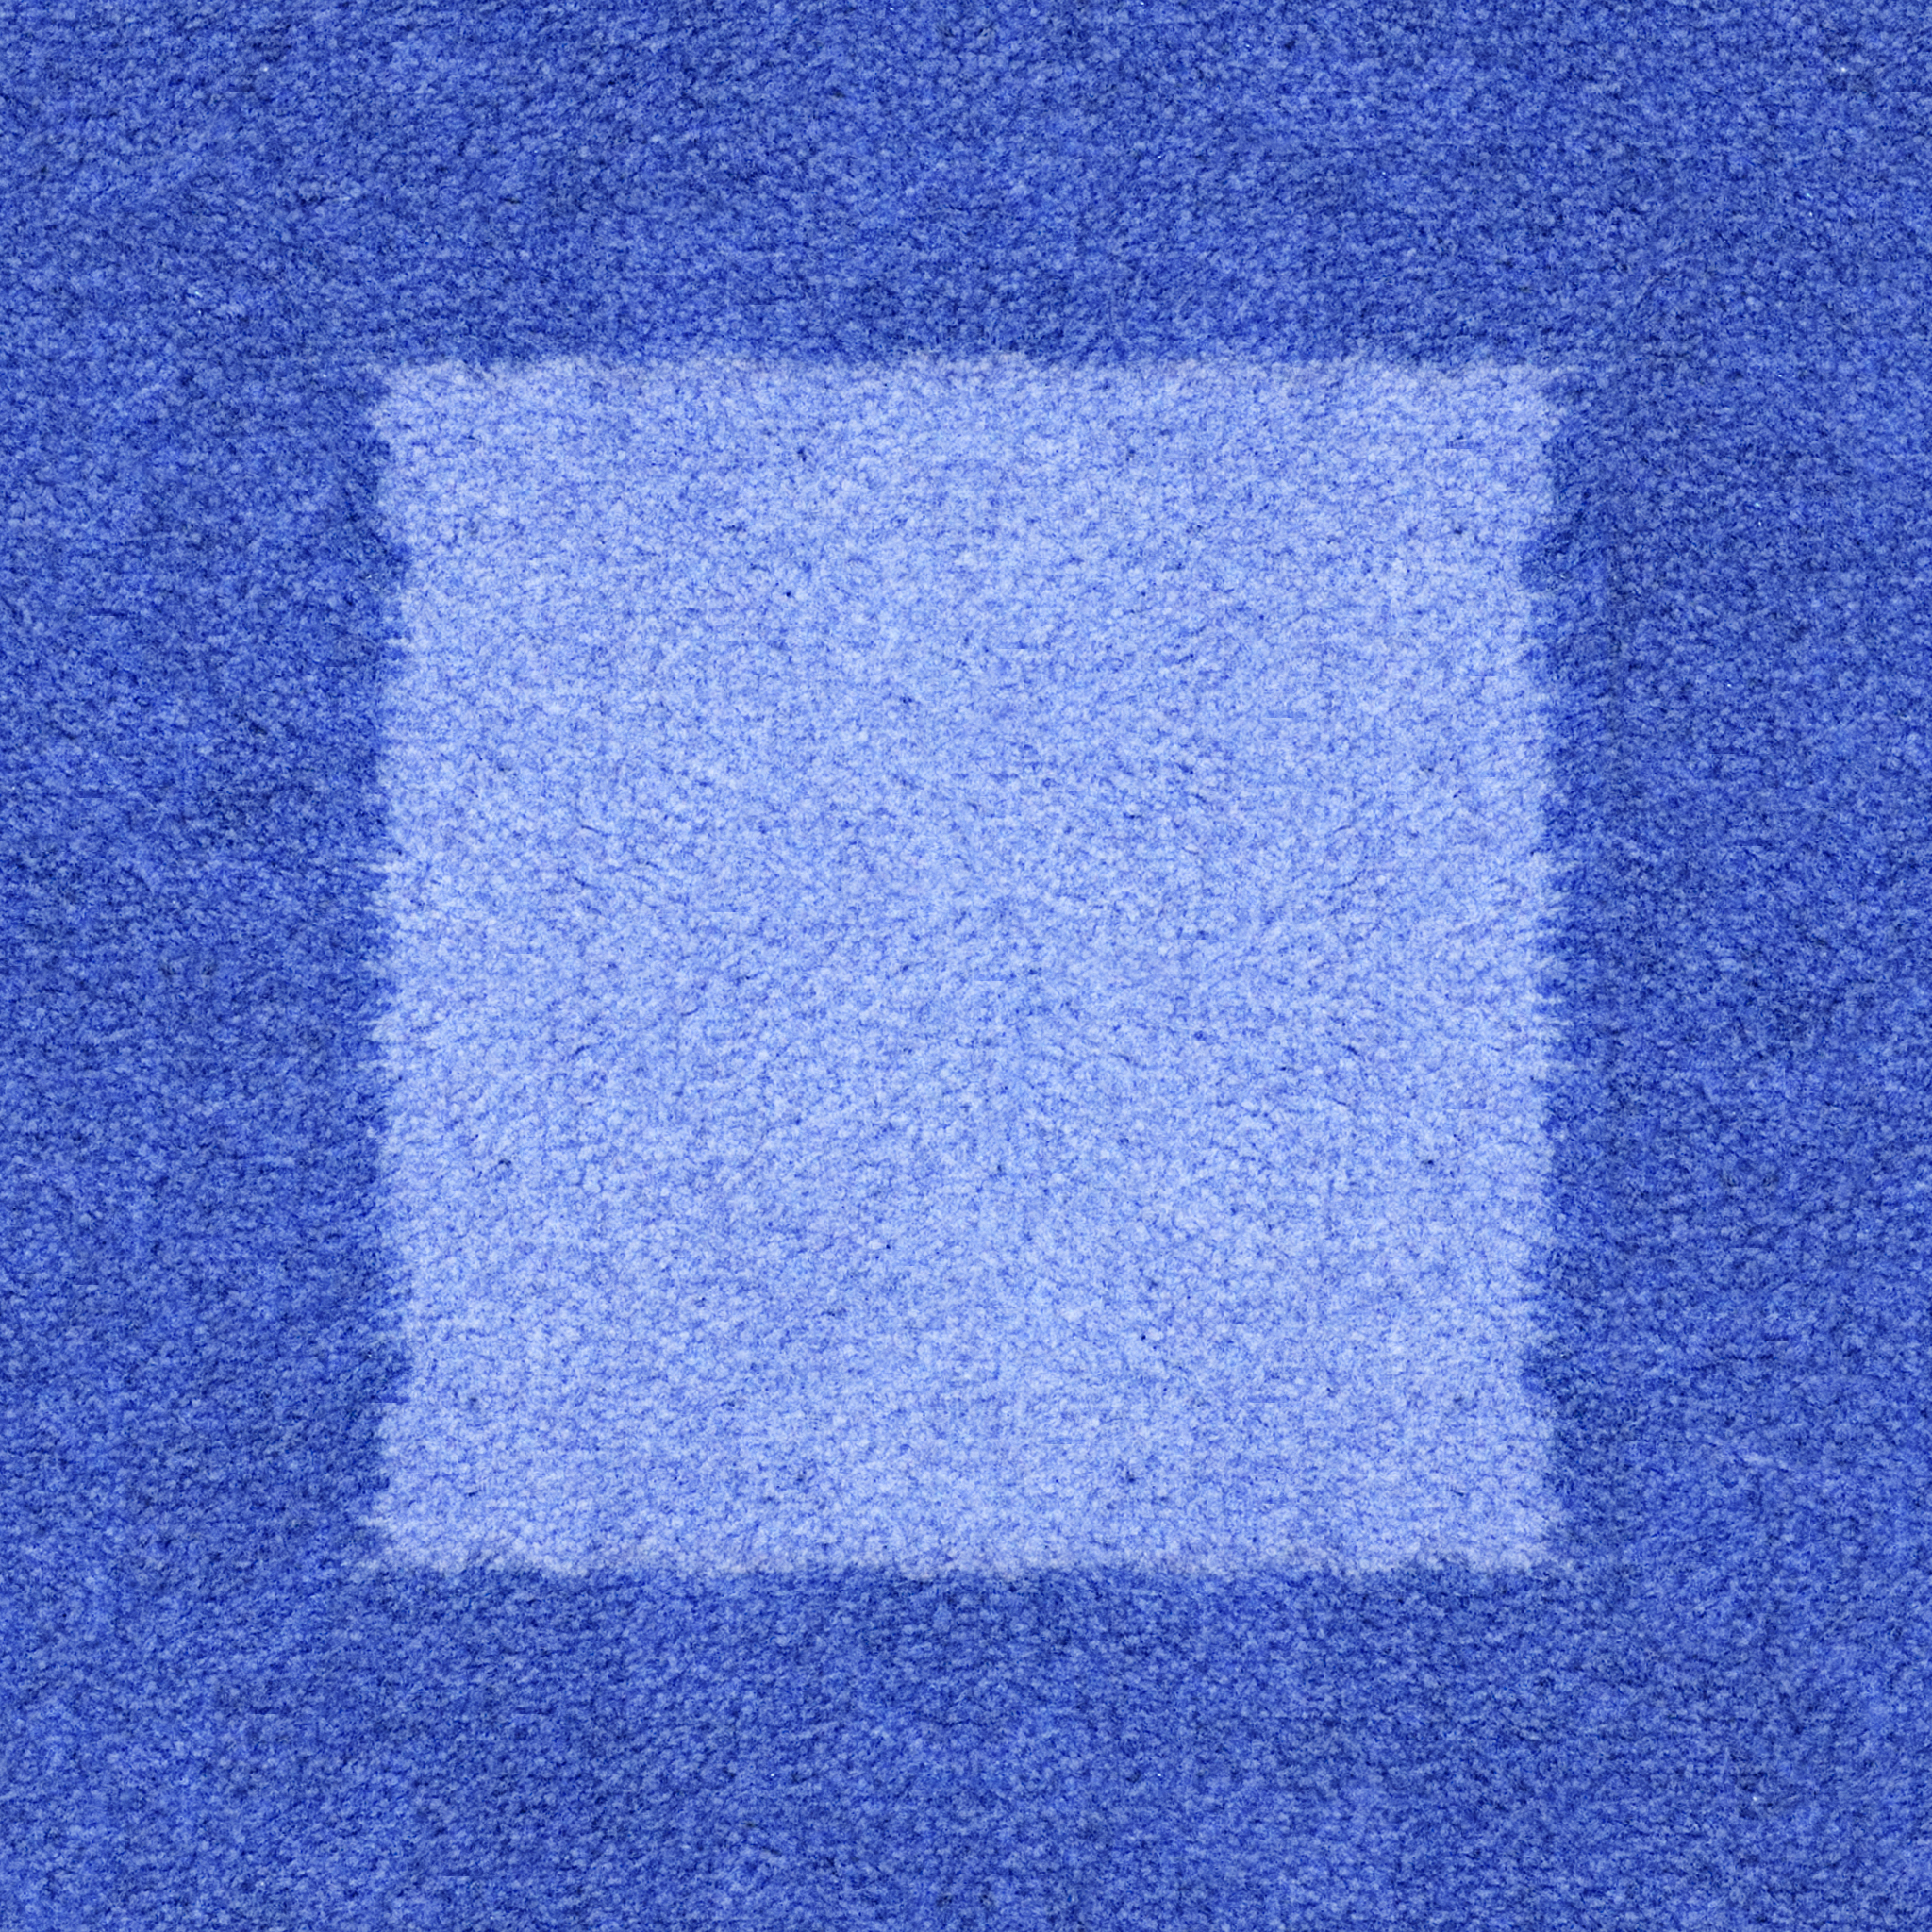 Blue Square Carpet.jpg